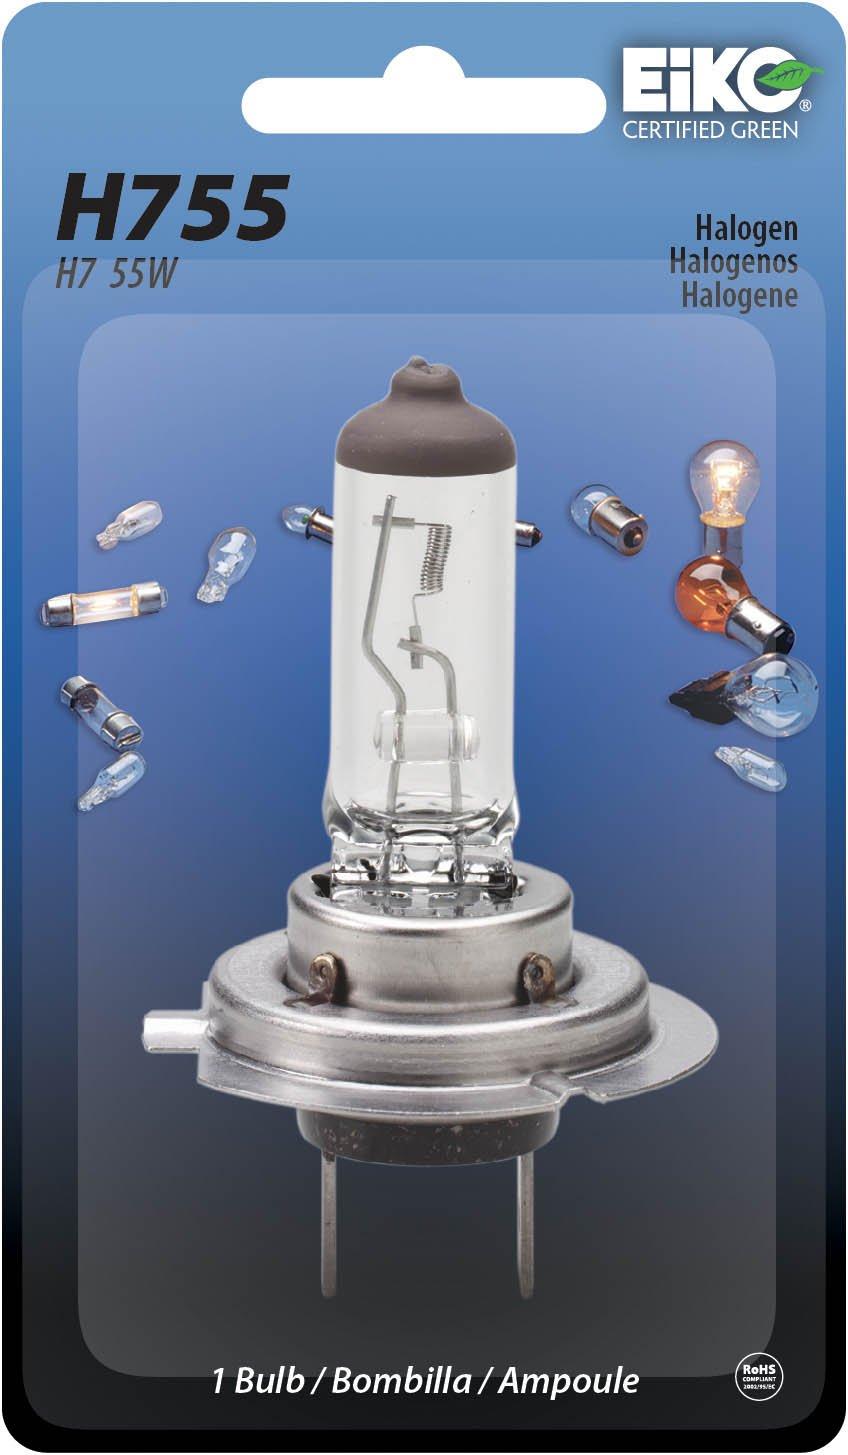 Amazon.com: Eiko H755-BP H7 Series Halogen Replacement Bulb, (Pack of 1): Automotive